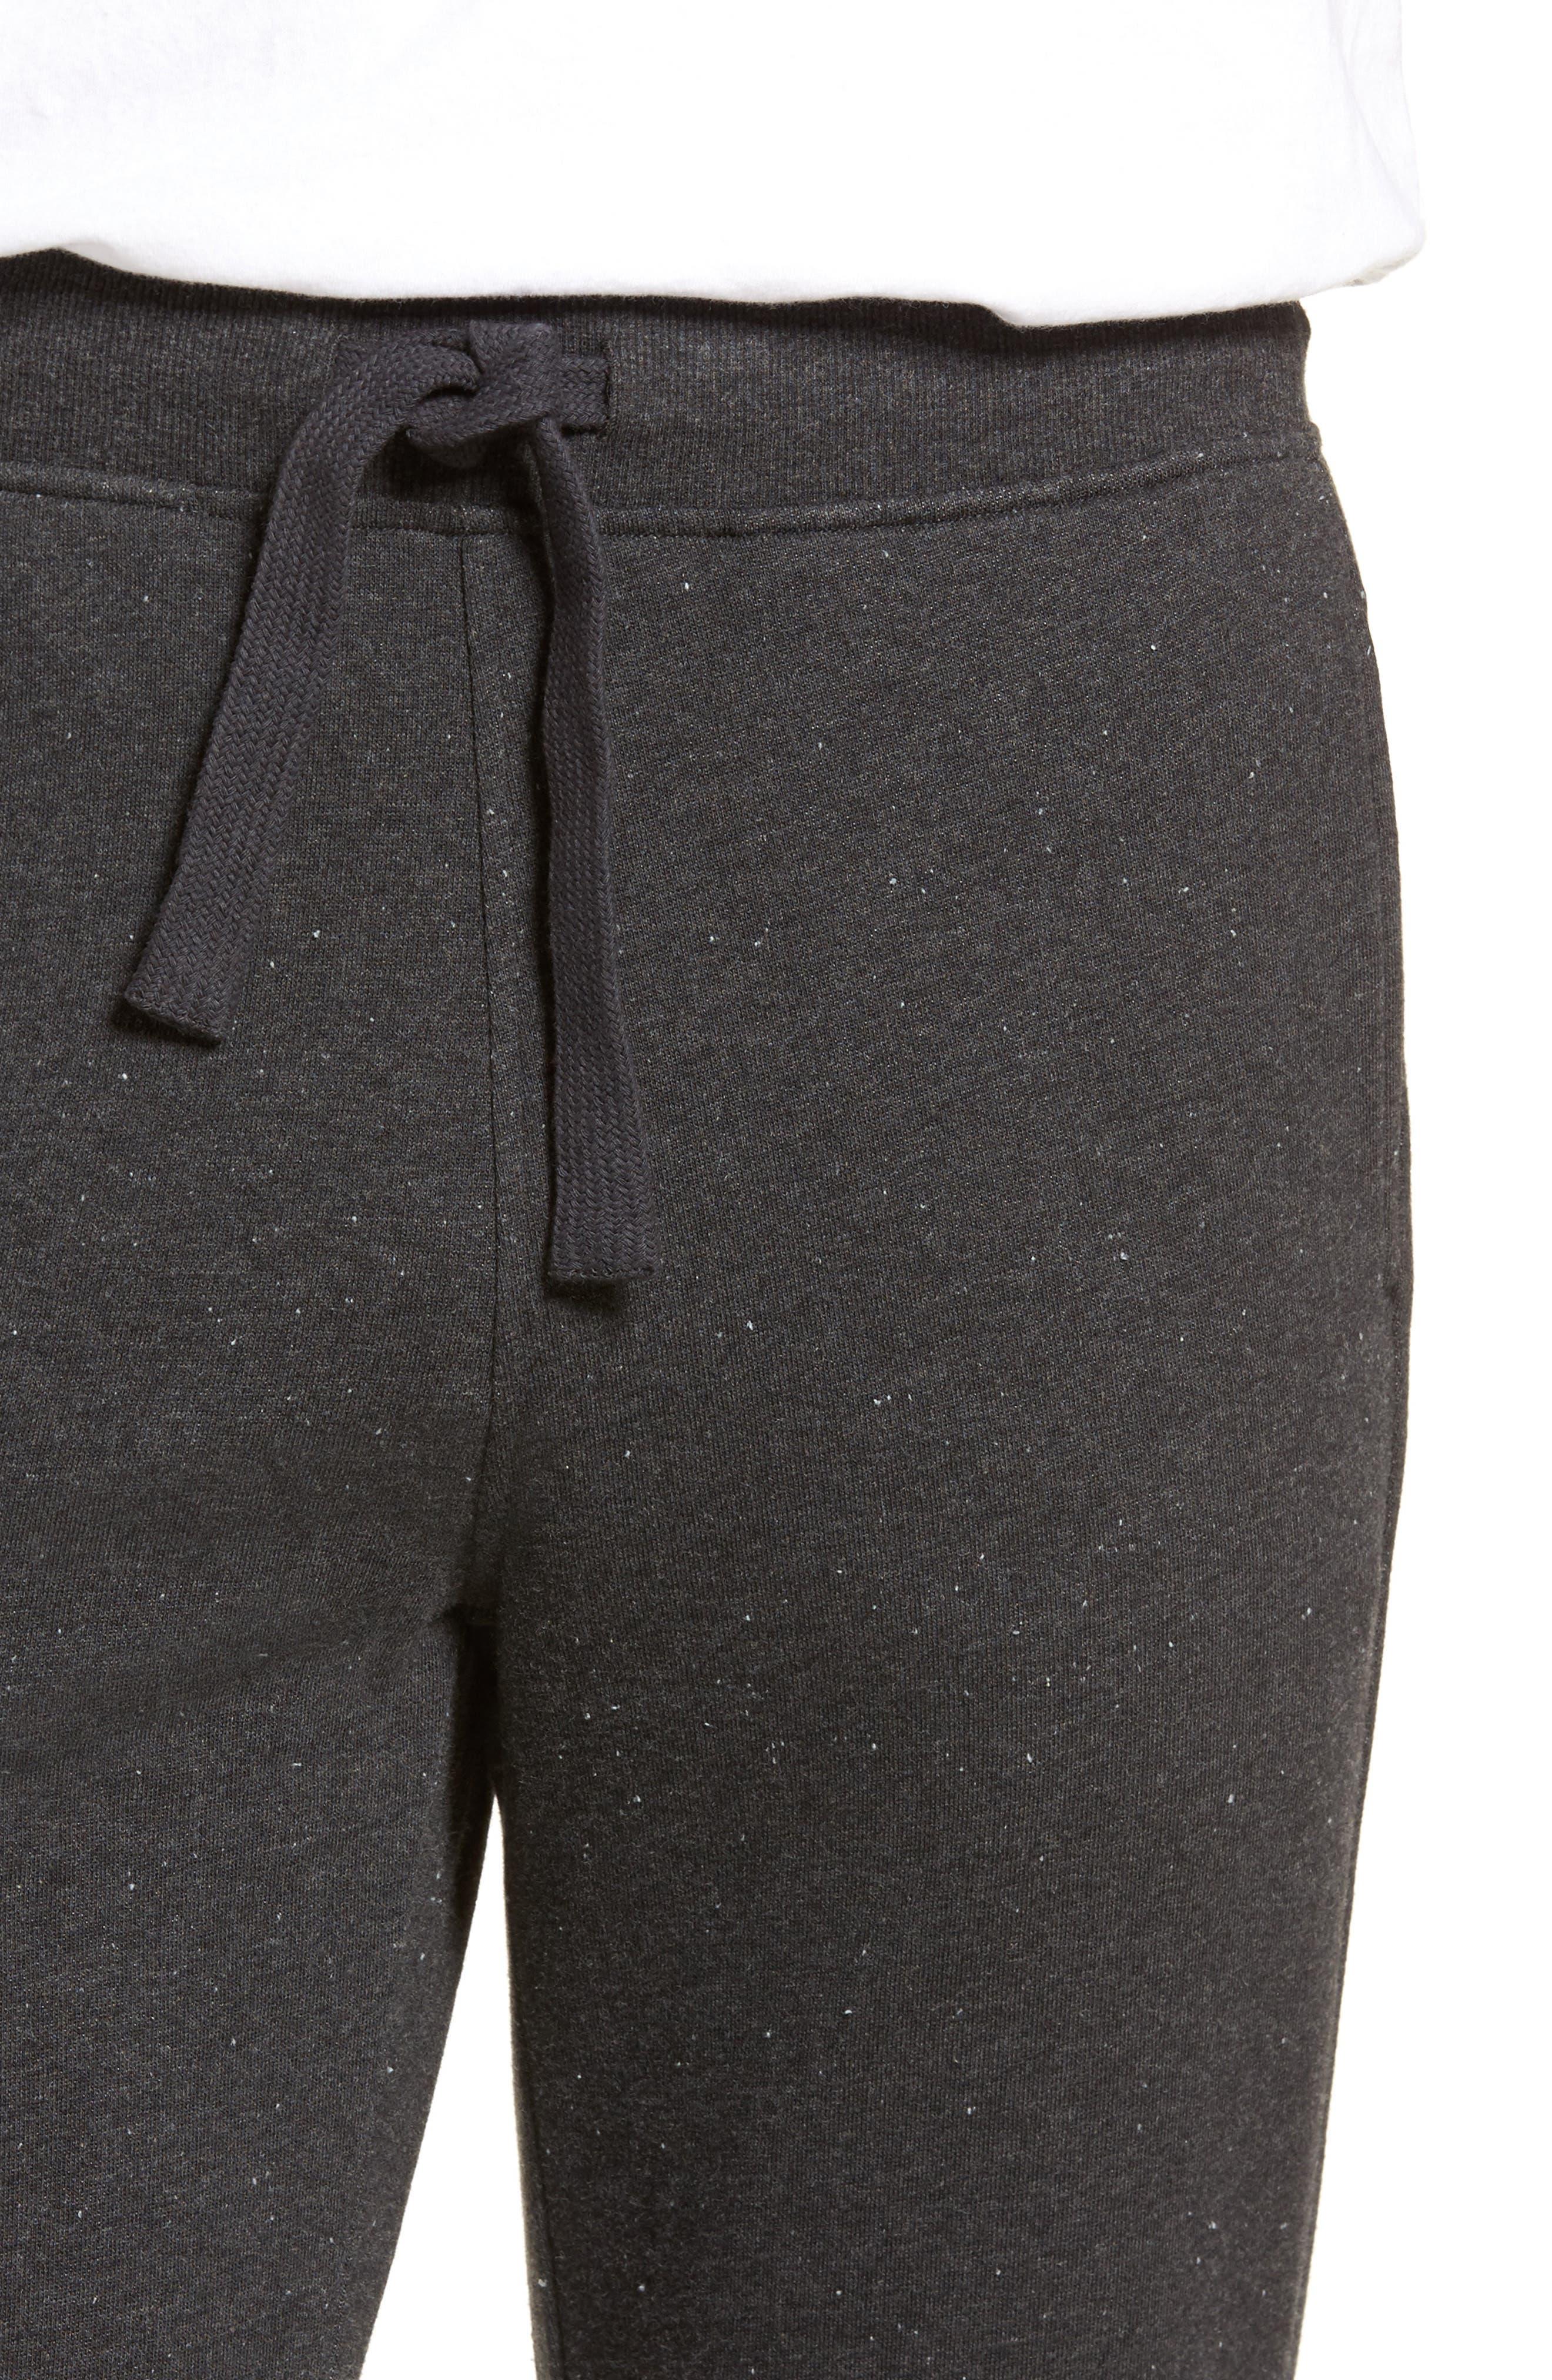 Wyatt Terry Cotton Blend Lounge Pants,                             Alternate thumbnail 4, color,                             BLACK